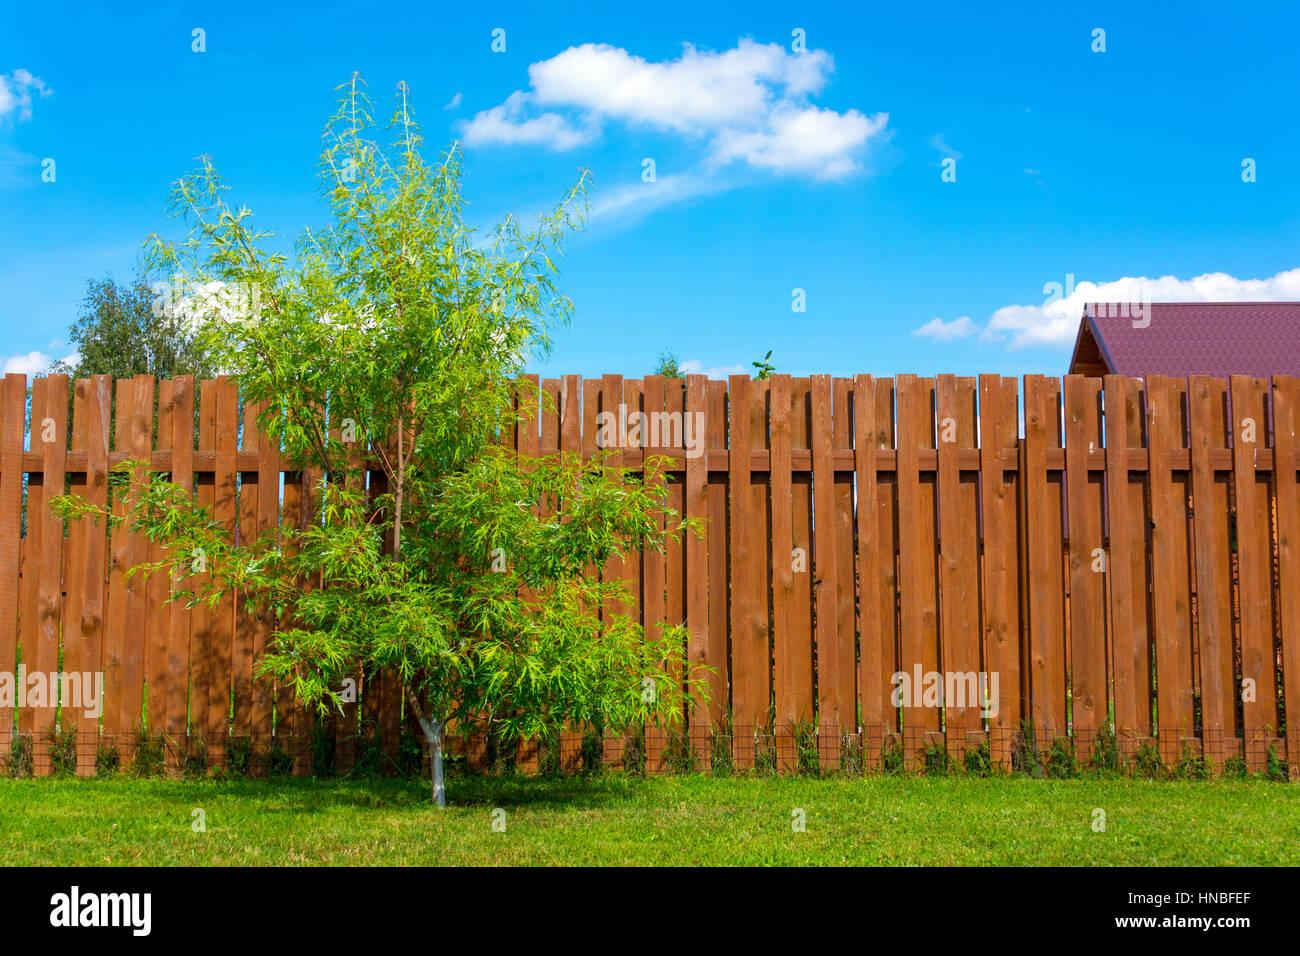 Recinzioni Per Case Di Montagna recinzione in legno in una casa di campagna foto & immagine